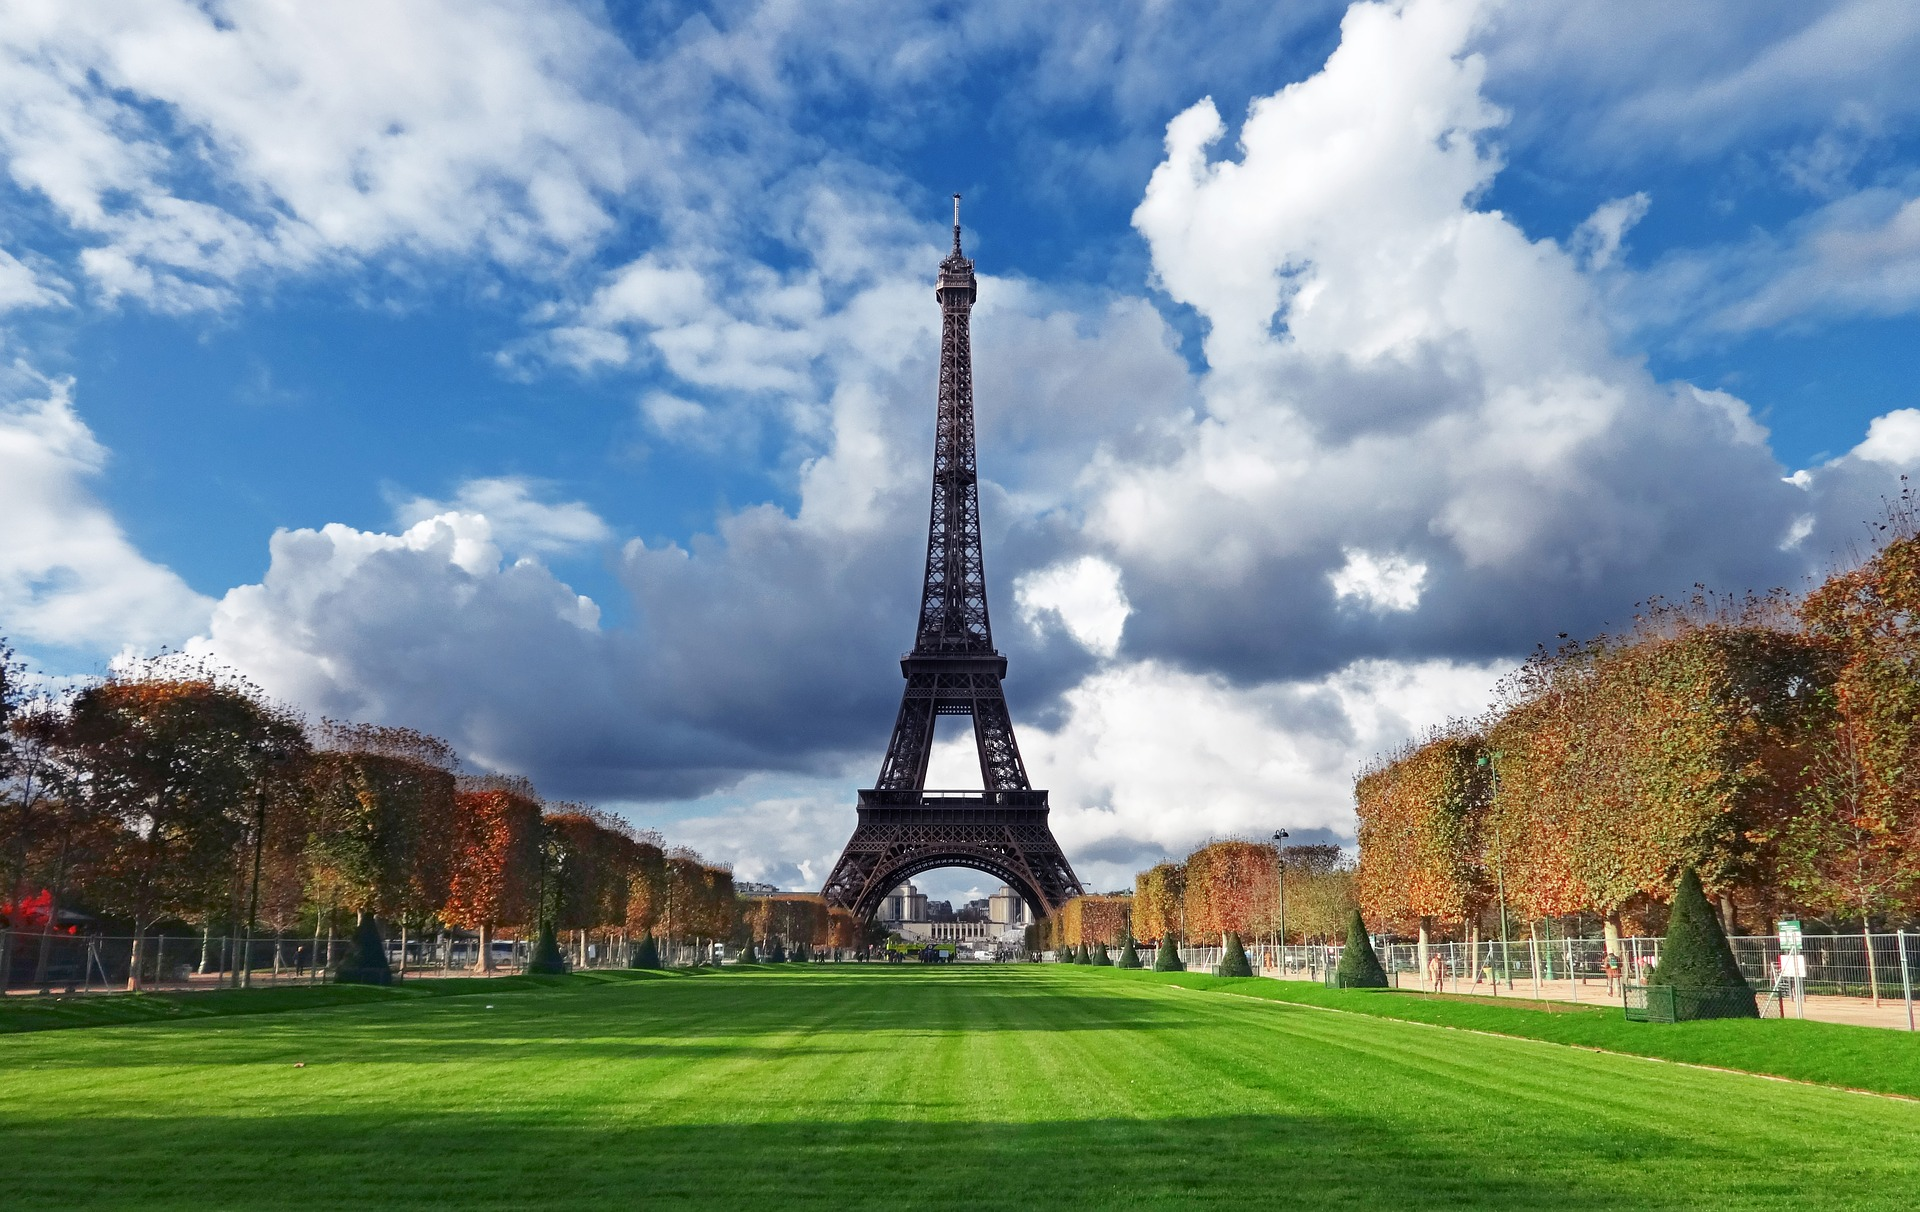 France, pays attractif pour les investissements gaming et esports